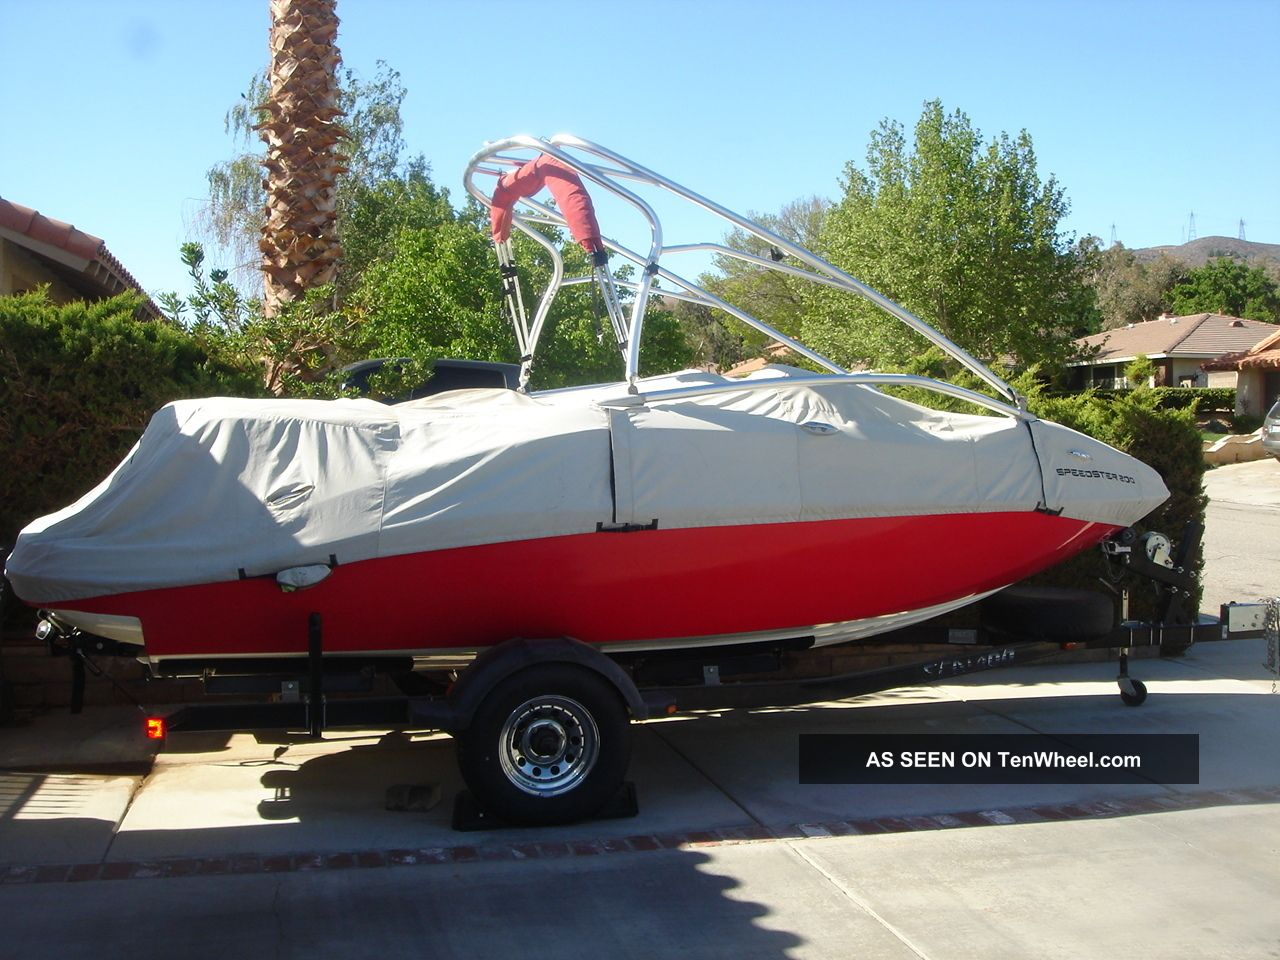 2005 Seadoo Speedster 200 Jet Boats photo